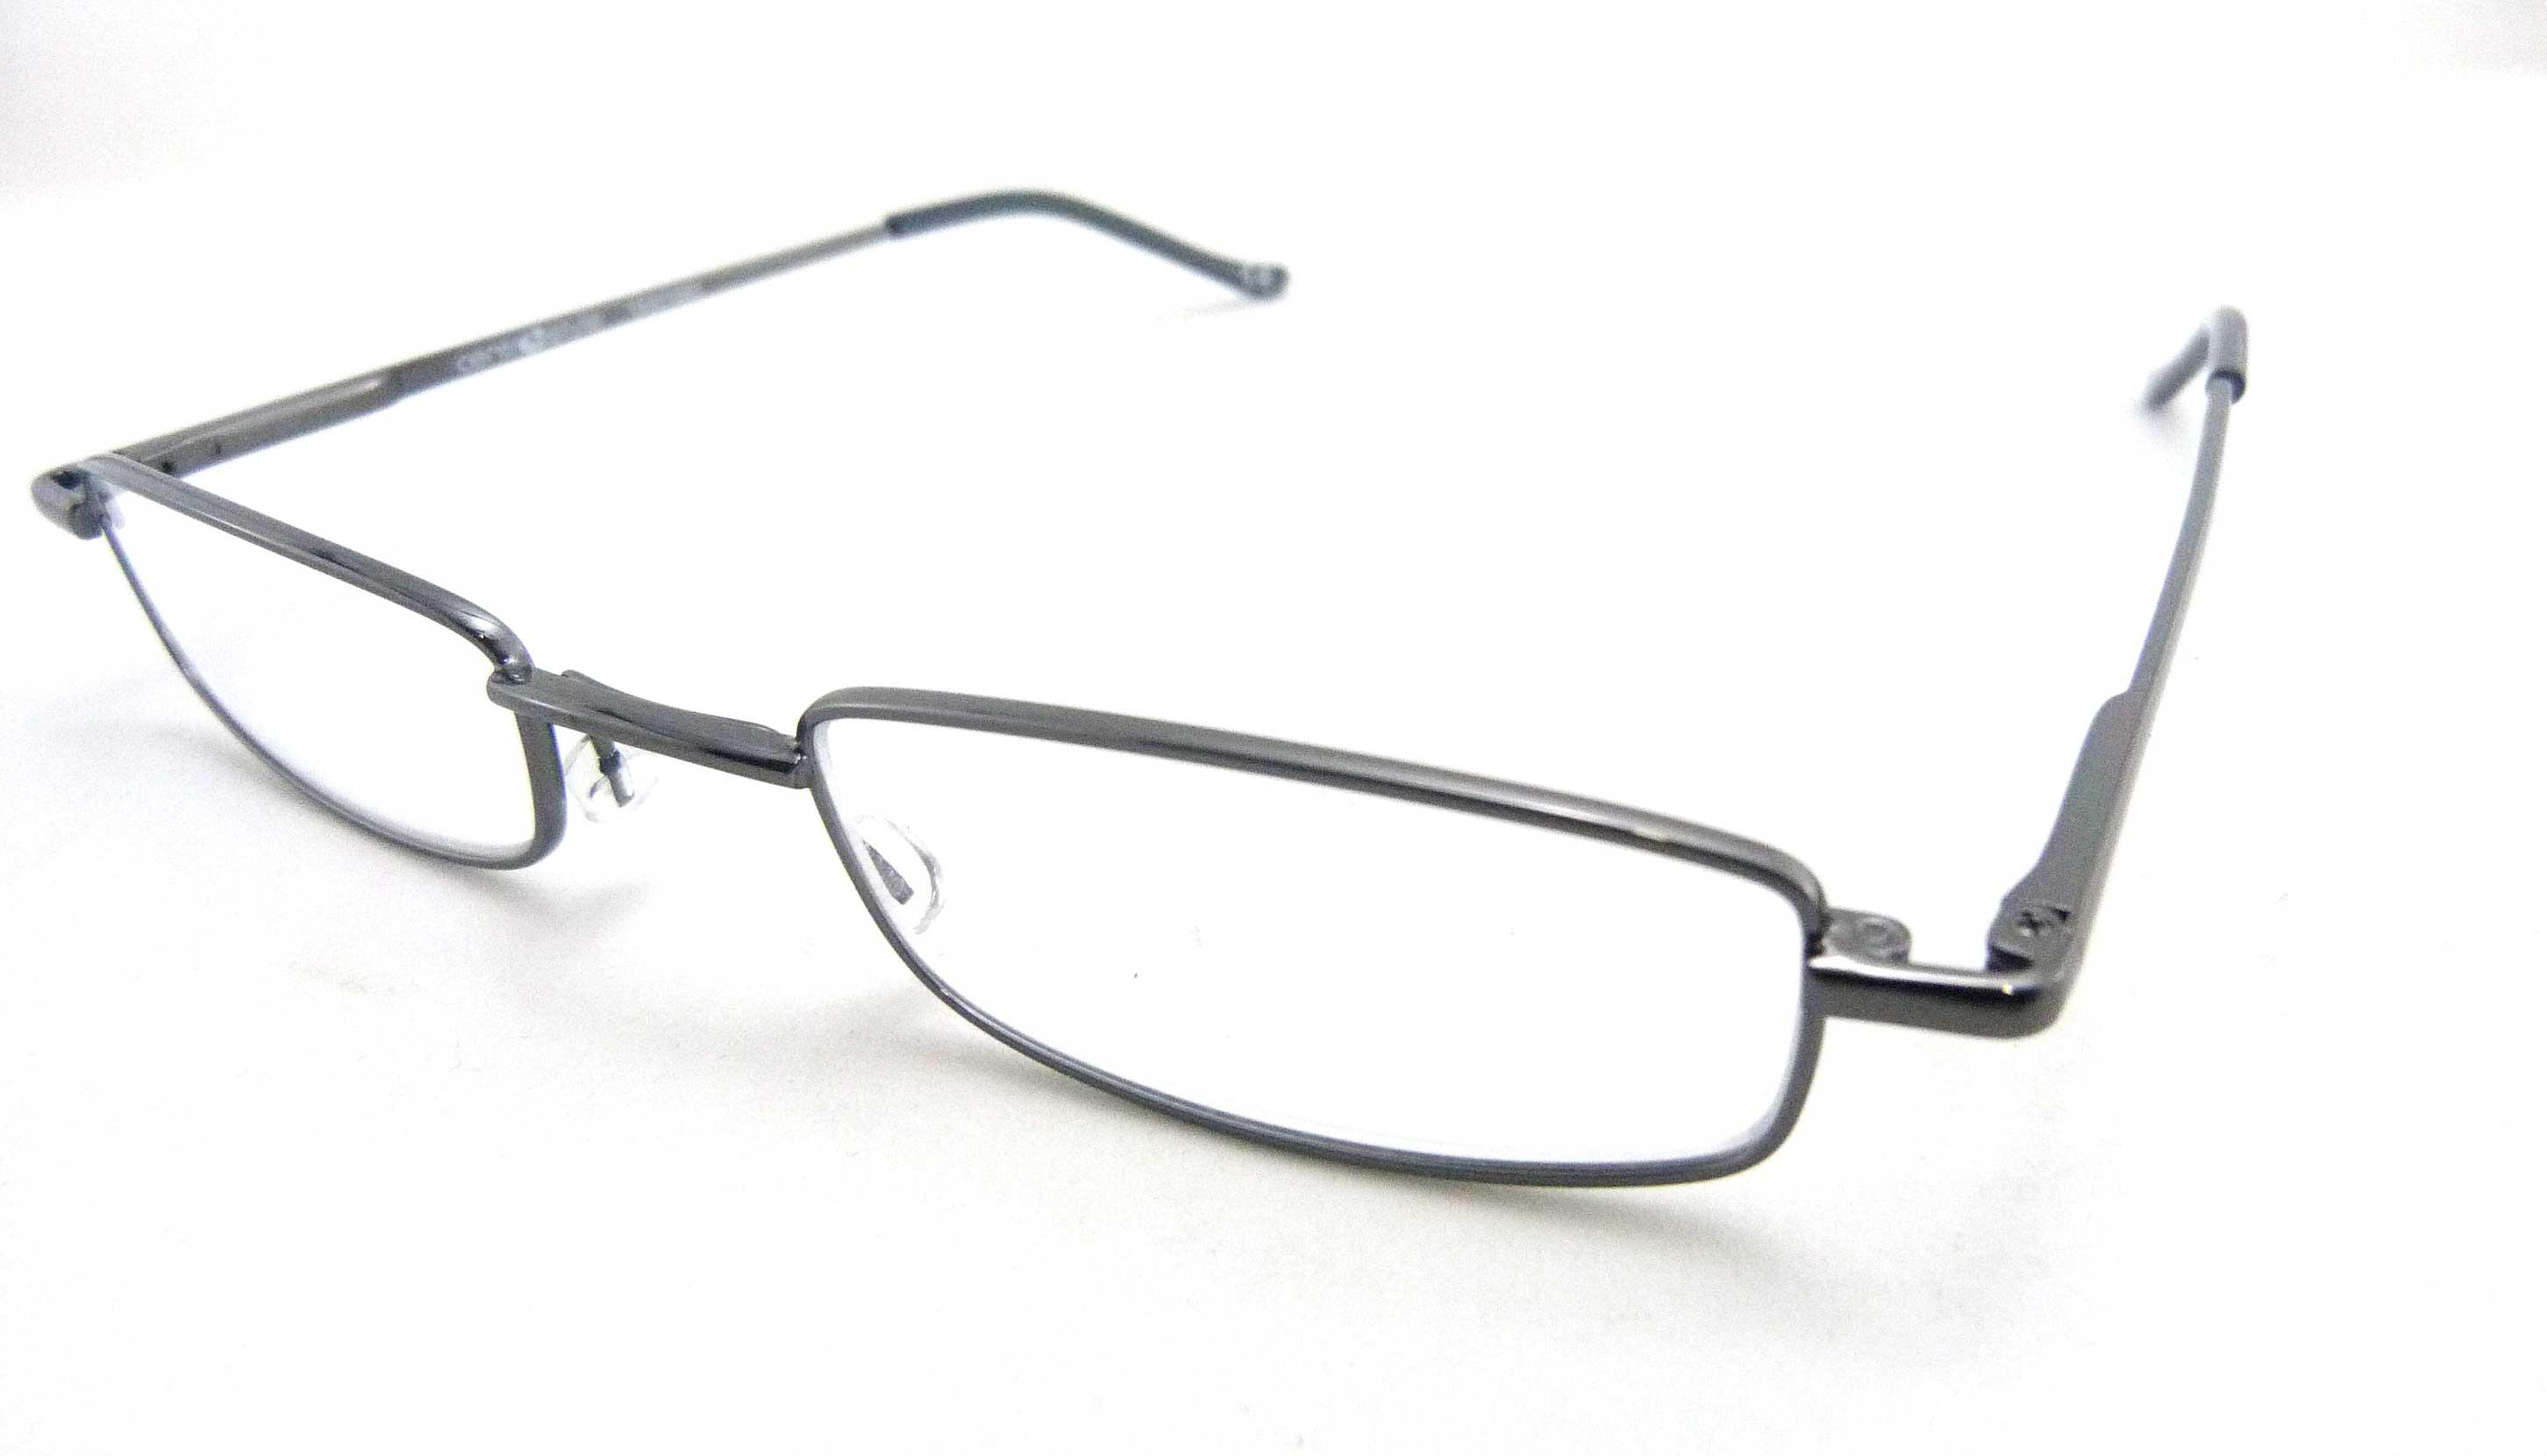 Óculos Leitura Flex AT +3,00 GunMetal Mod 63508 FLAG E